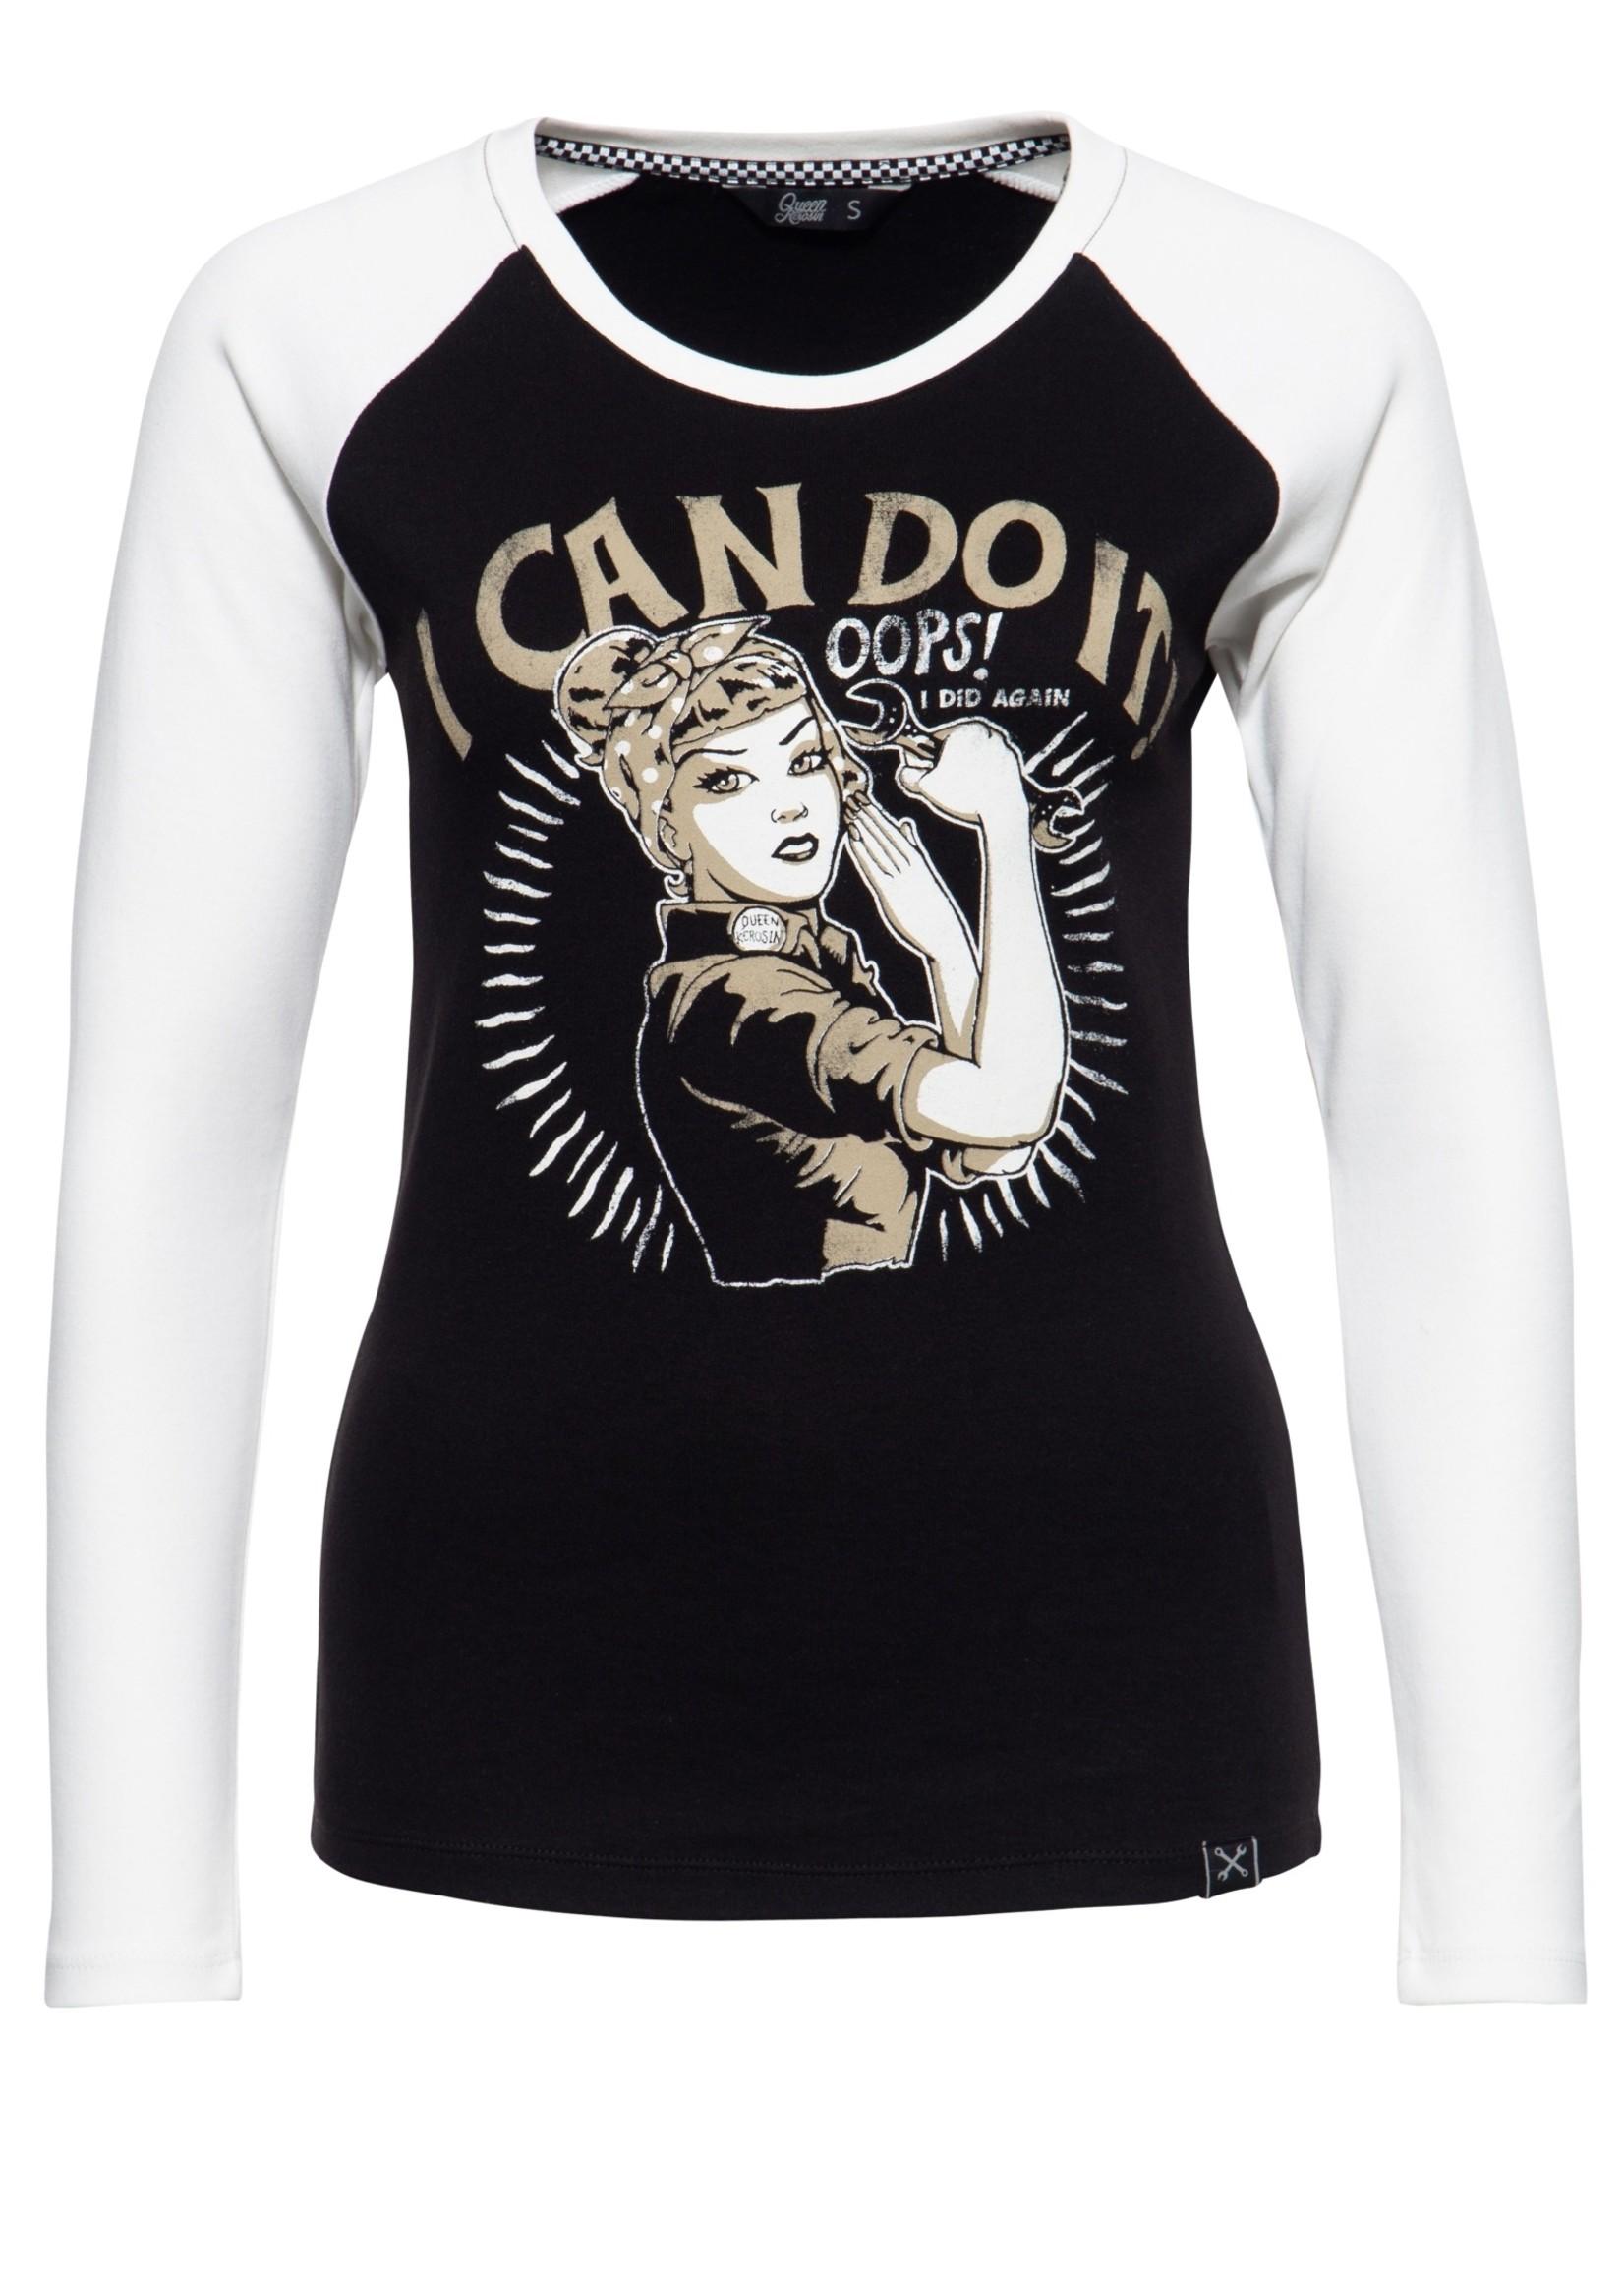 Queen Kerosin Queen Kerosin I Can Do It Long Sleeve T-shirt in Black and Off-White